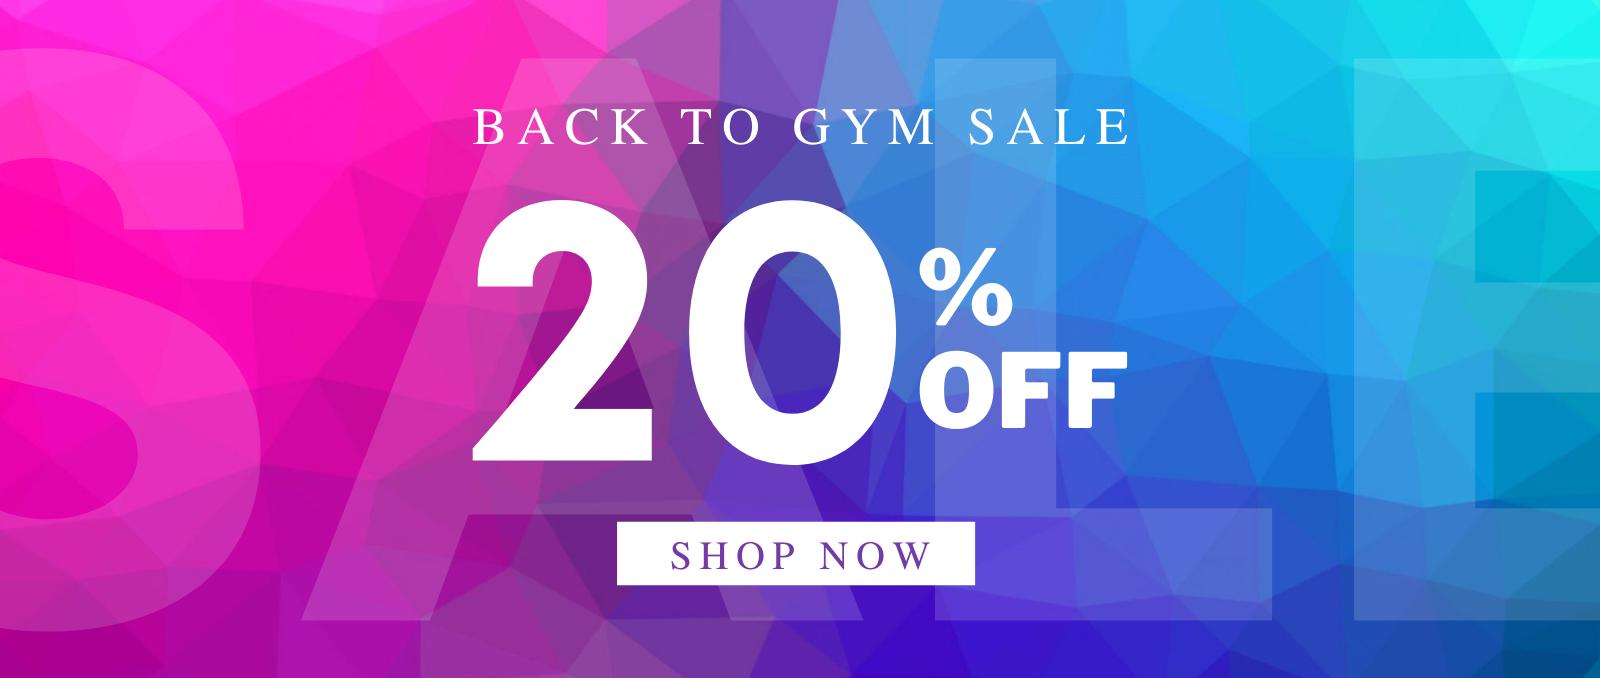 2020 gymnastics leotards sale 20% off